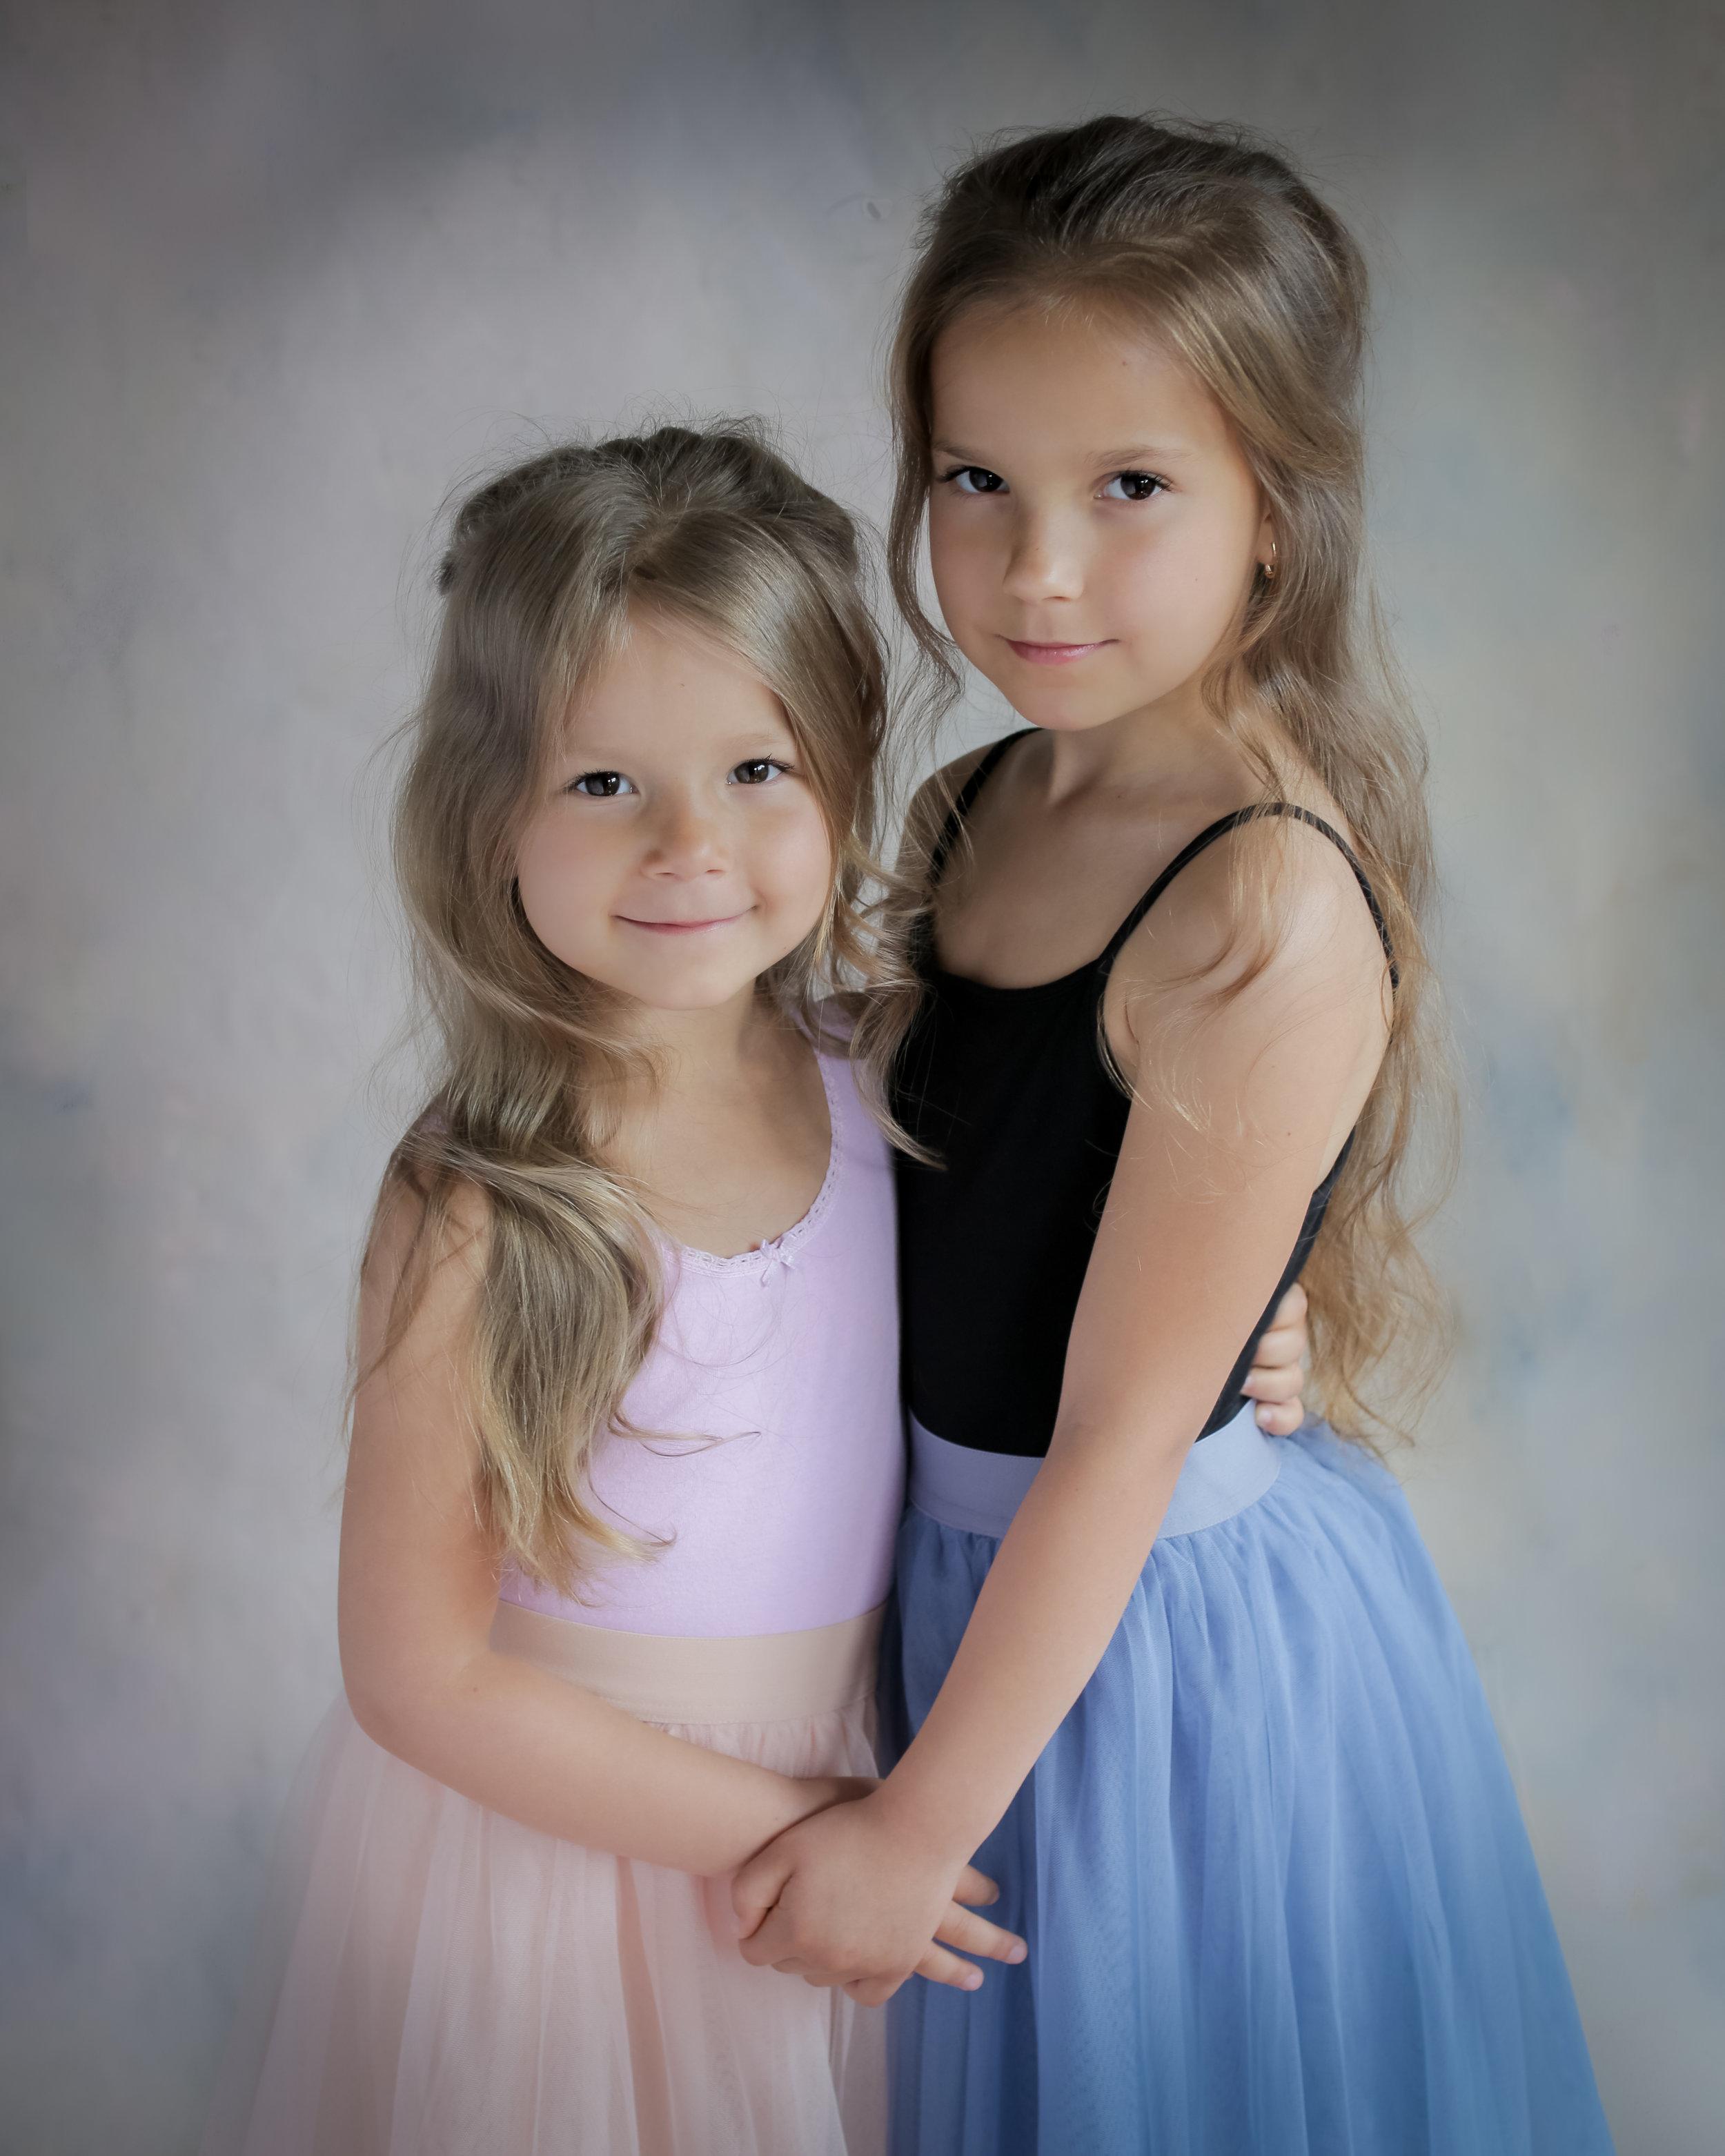 girls-5.jpg